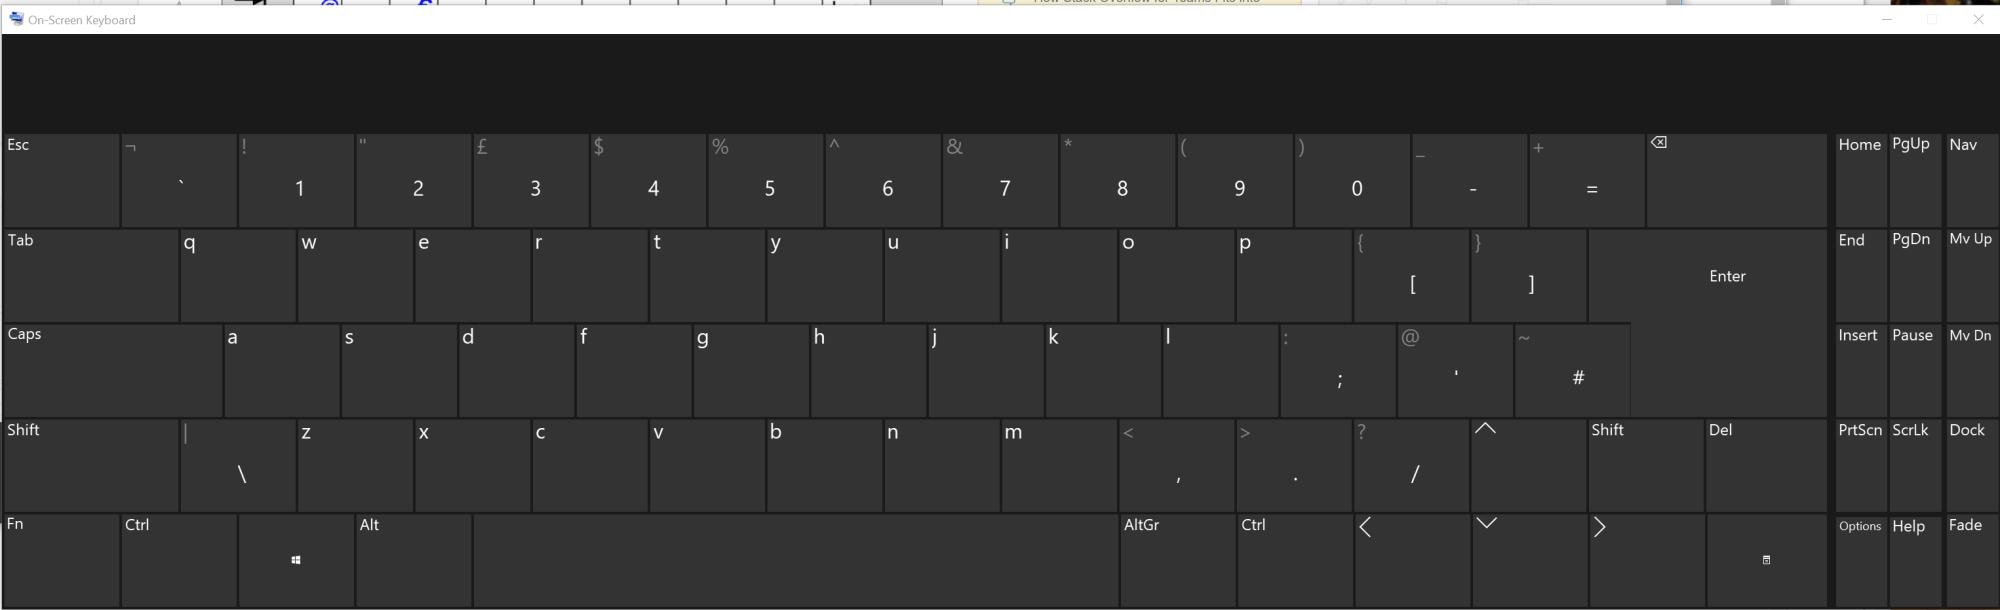 hight resolution of windows tool to generate keyboard layout diagram software keyboard layout design keyboard layout diagram